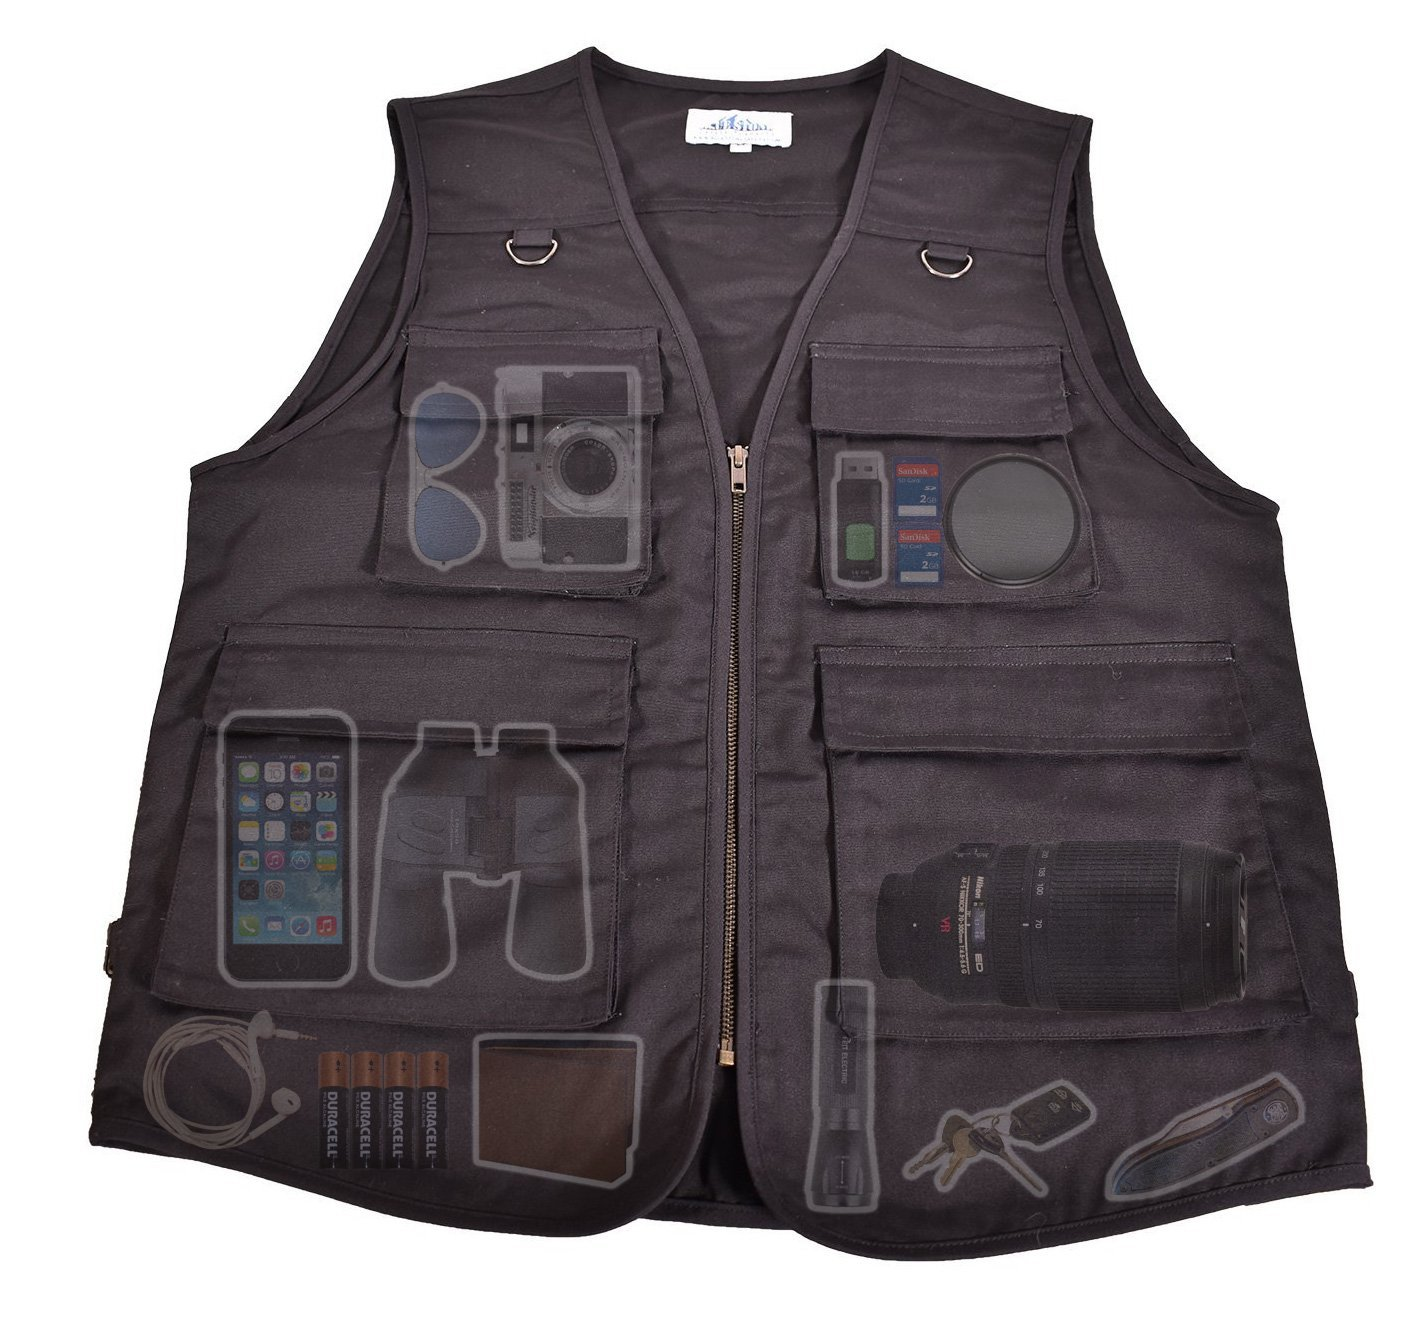 Outdoor Safari Photographer's Vest| Travel Vest| Hiking Vest| Fishing Vest| Sports Vest| Utility Vest| Bird Watching Vest| Durable Work vest| Keep all of your items within reach!|